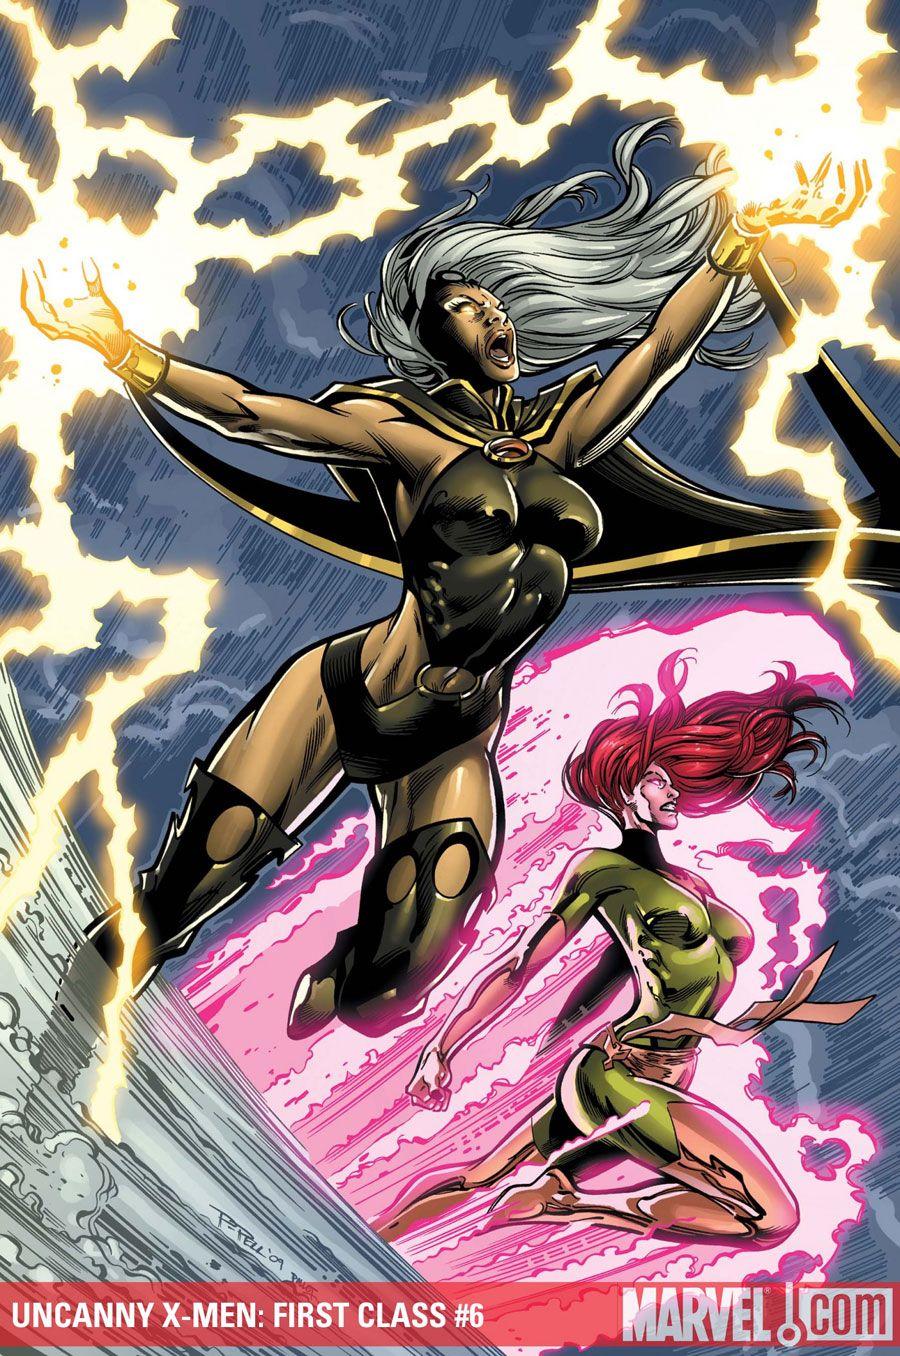 X Men Years Of Future Past 4 Art Adams Google Search Jean Grey Hq Marvel Marvel